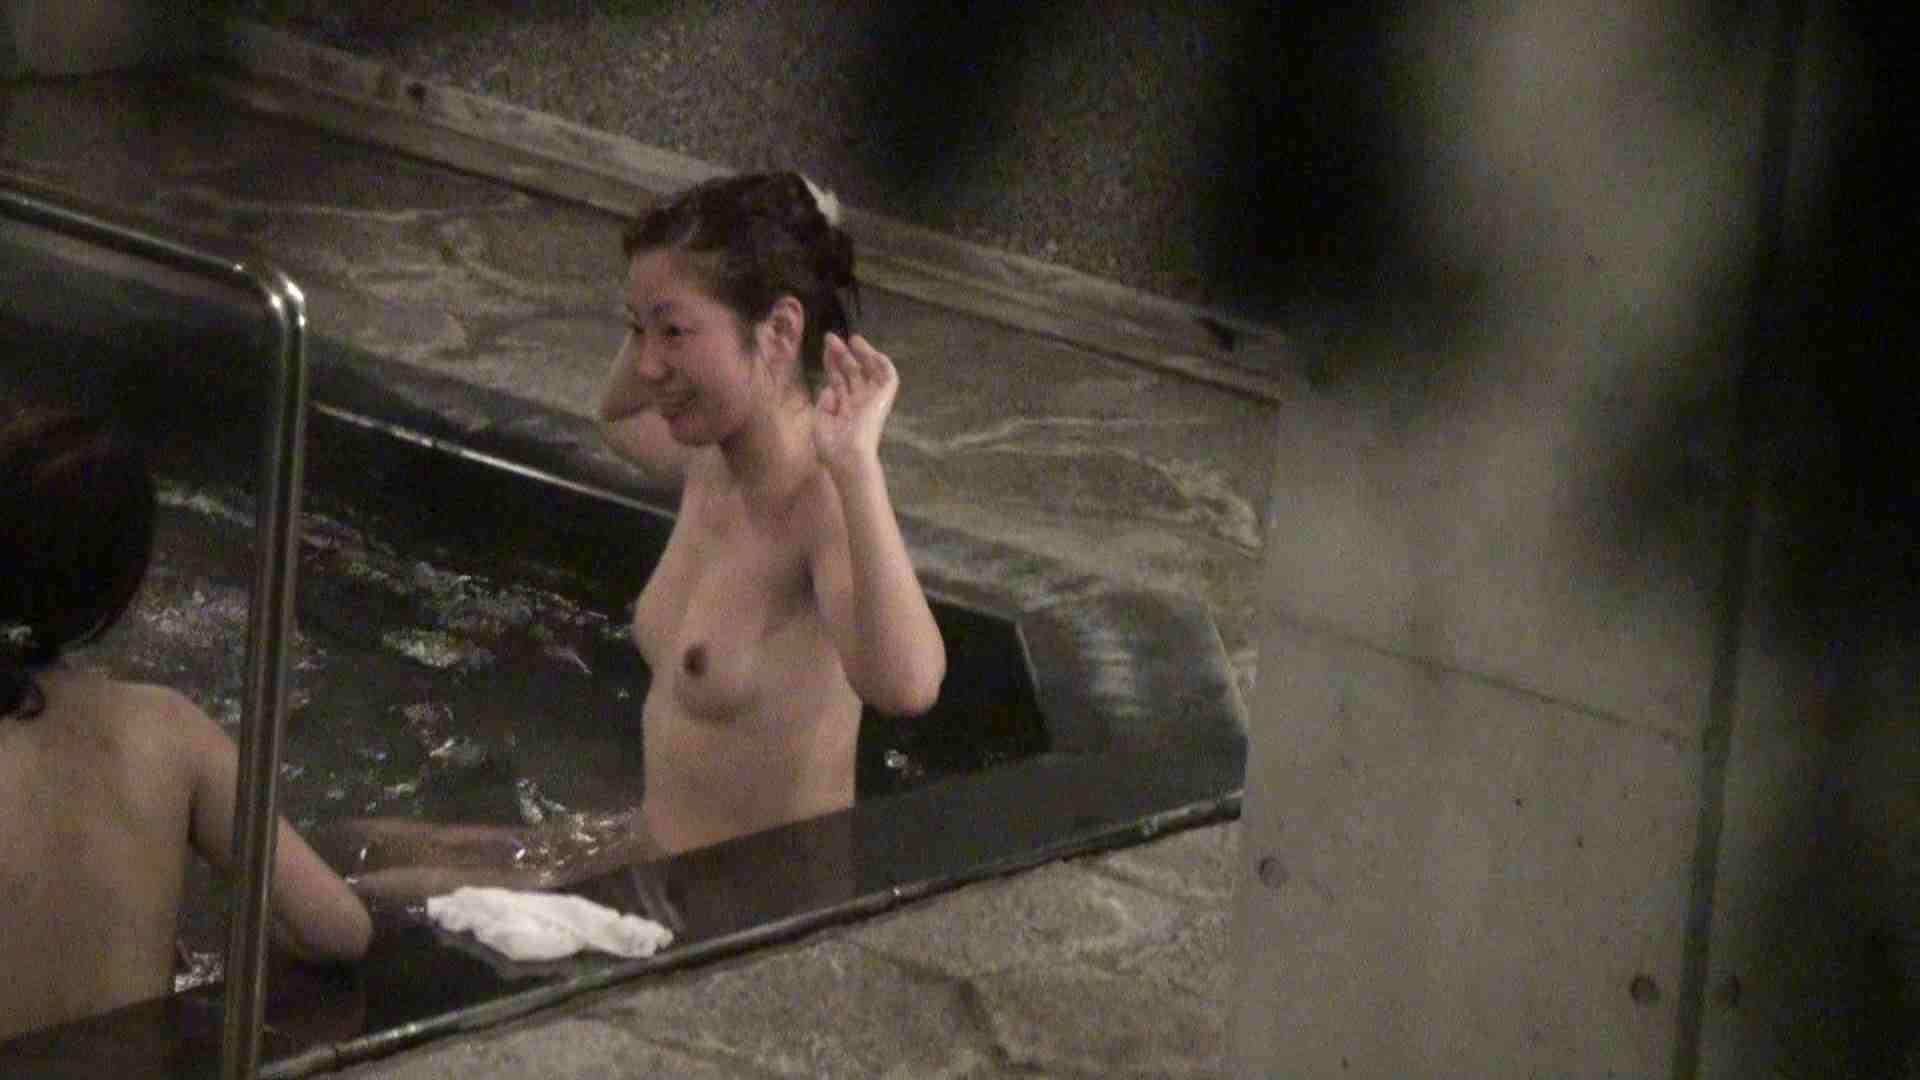 Aquaな露天風呂Vol.422 盗撮映像  61Pix 48